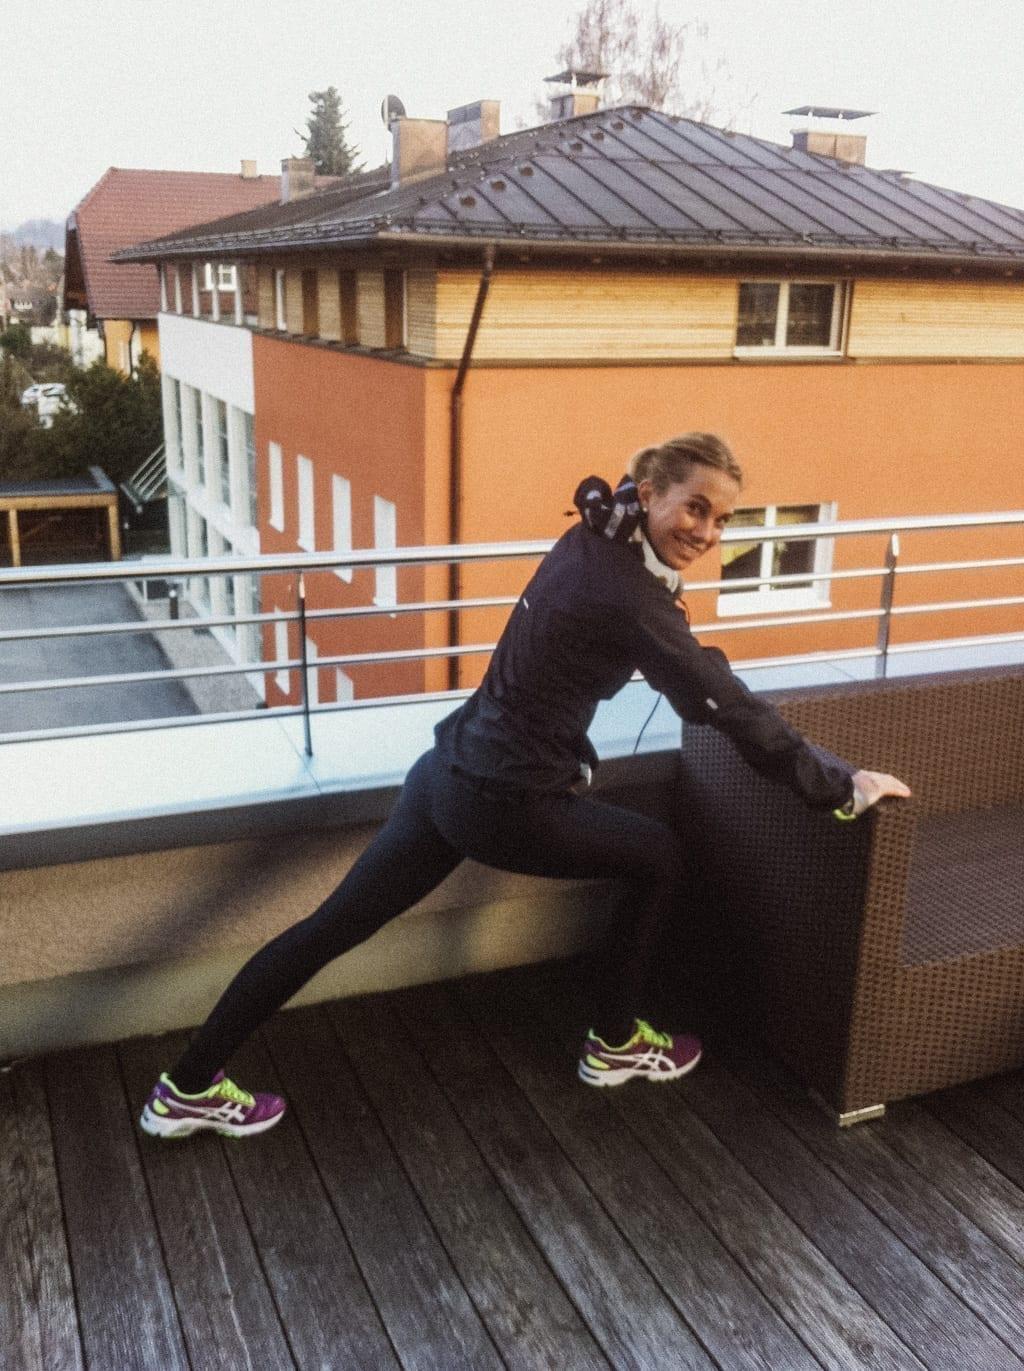 ck-constantlyk-com-fitness-sports-apler-3847